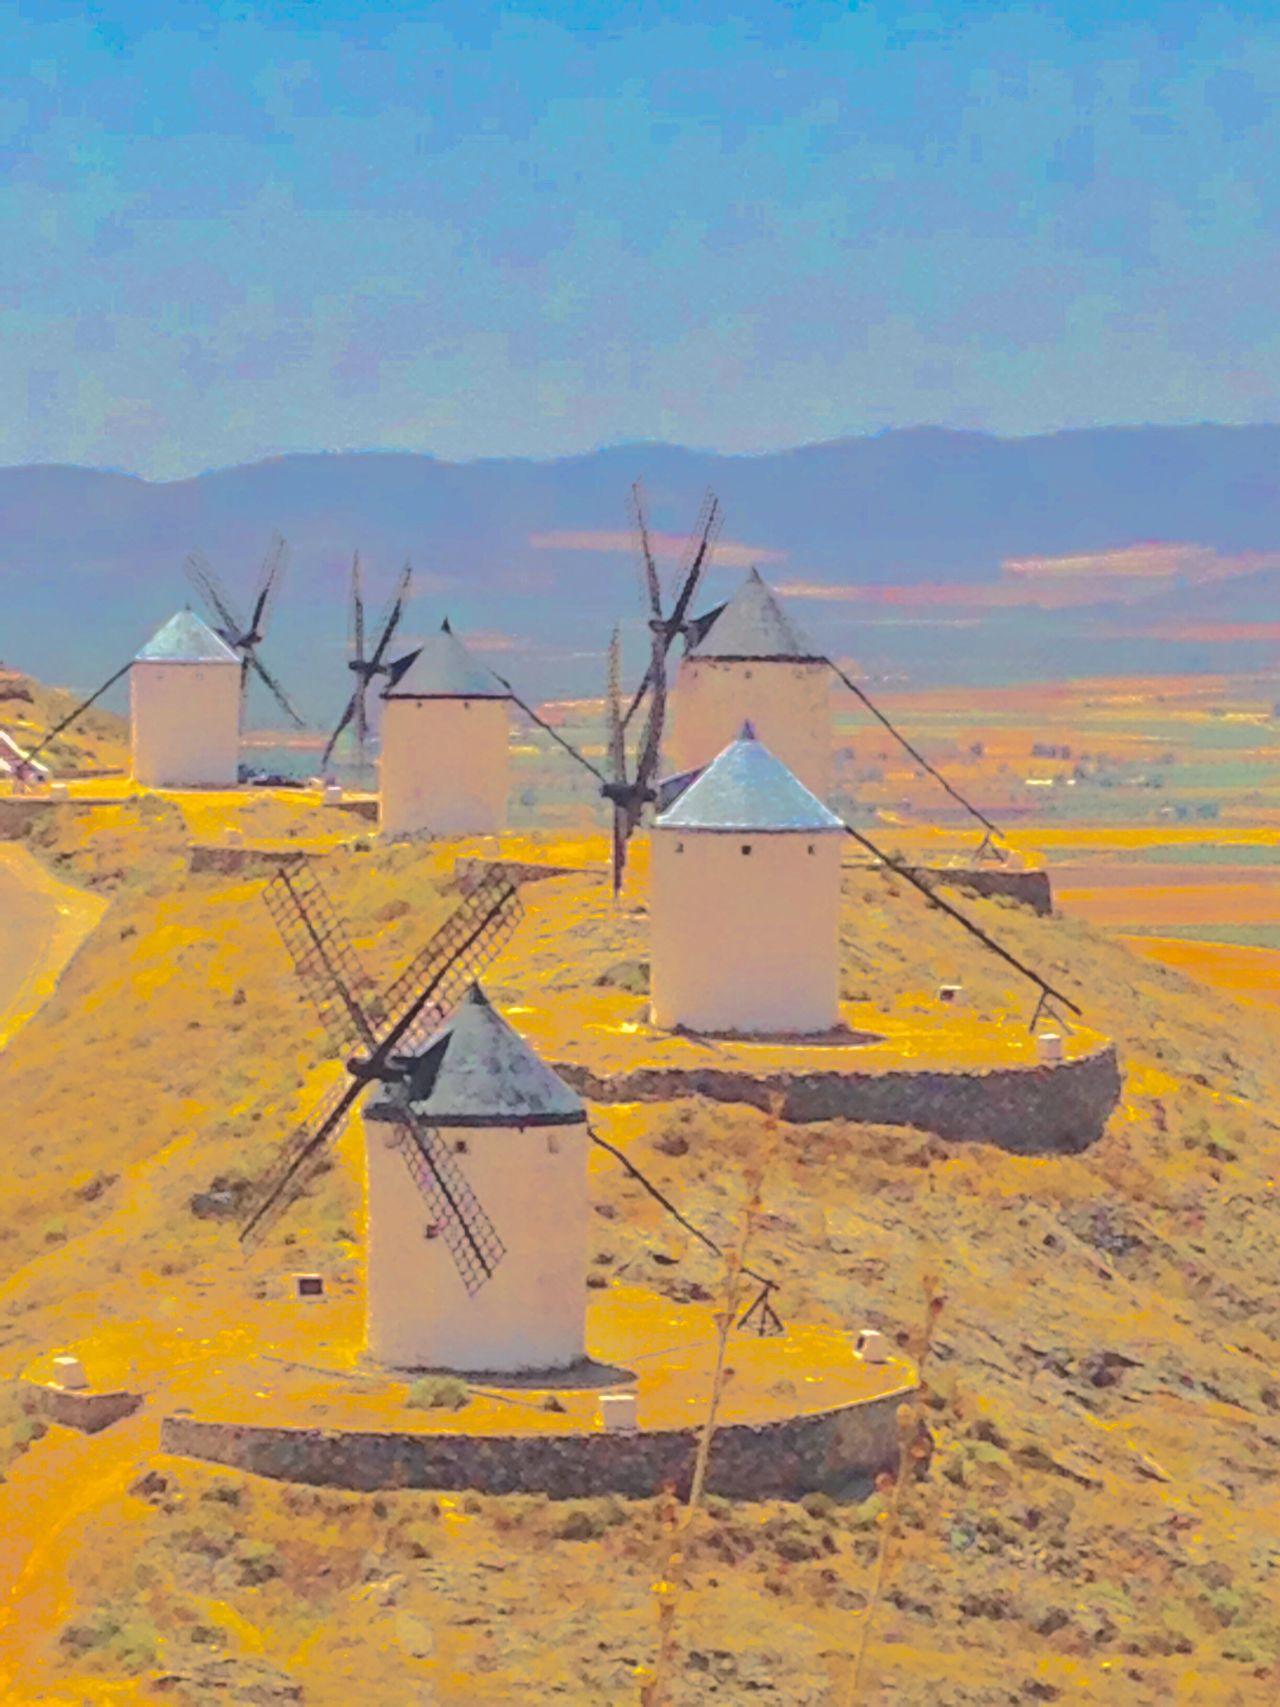 Spanish Windmill SPAIN La Mancha Windmills Landscape Consuegra